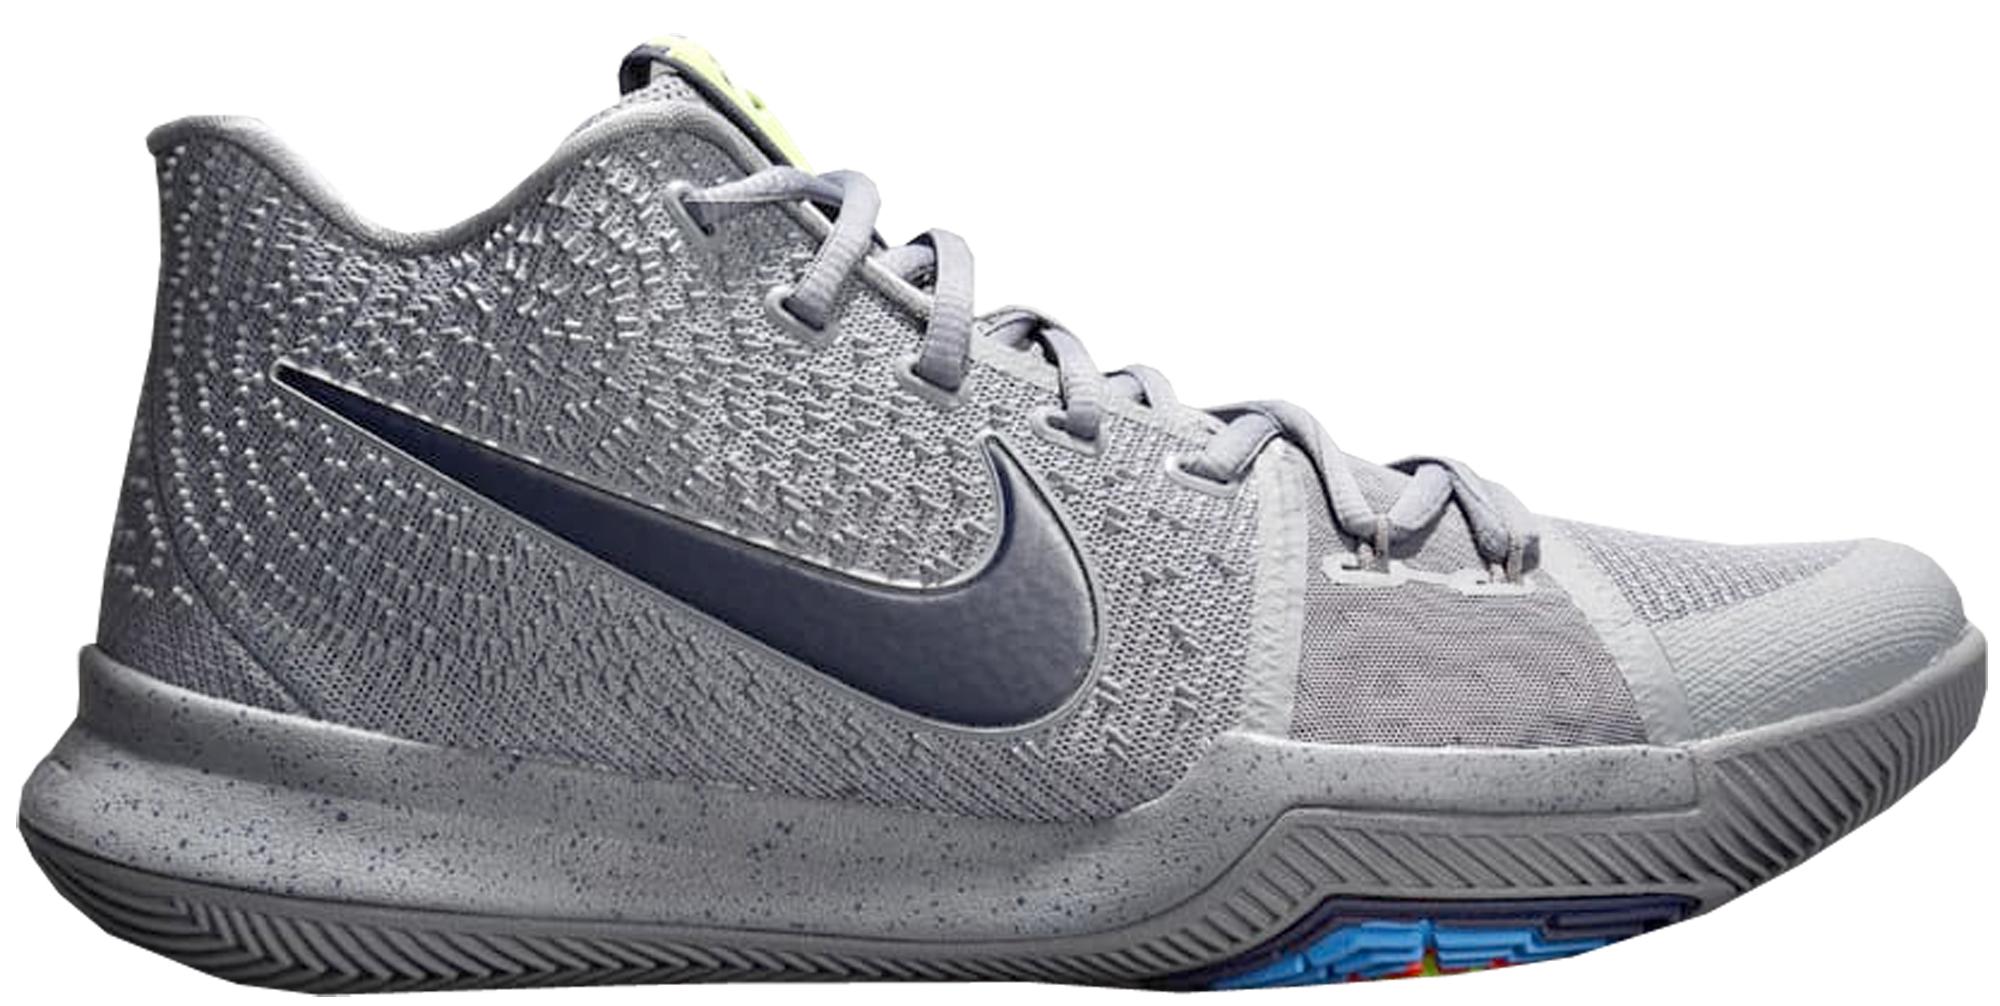 Nike Kyrie 3 Cool Grey Midnight Navy